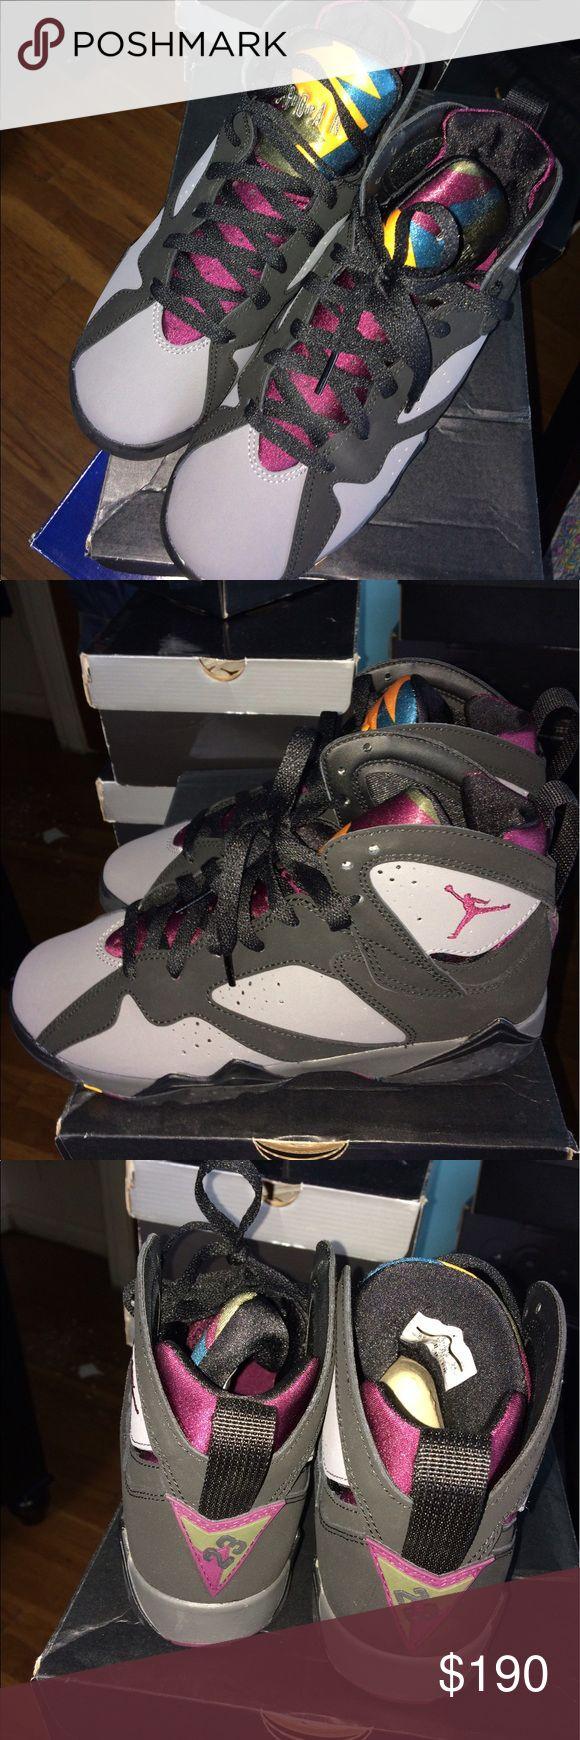 "Boys Air Jordan Retro 7 ""Bordeaux"" Boys (Grade School) Size 6. NEVER Worn Only Tried On & Comes In Original Box! Air Jordan Shoes Sneakers"